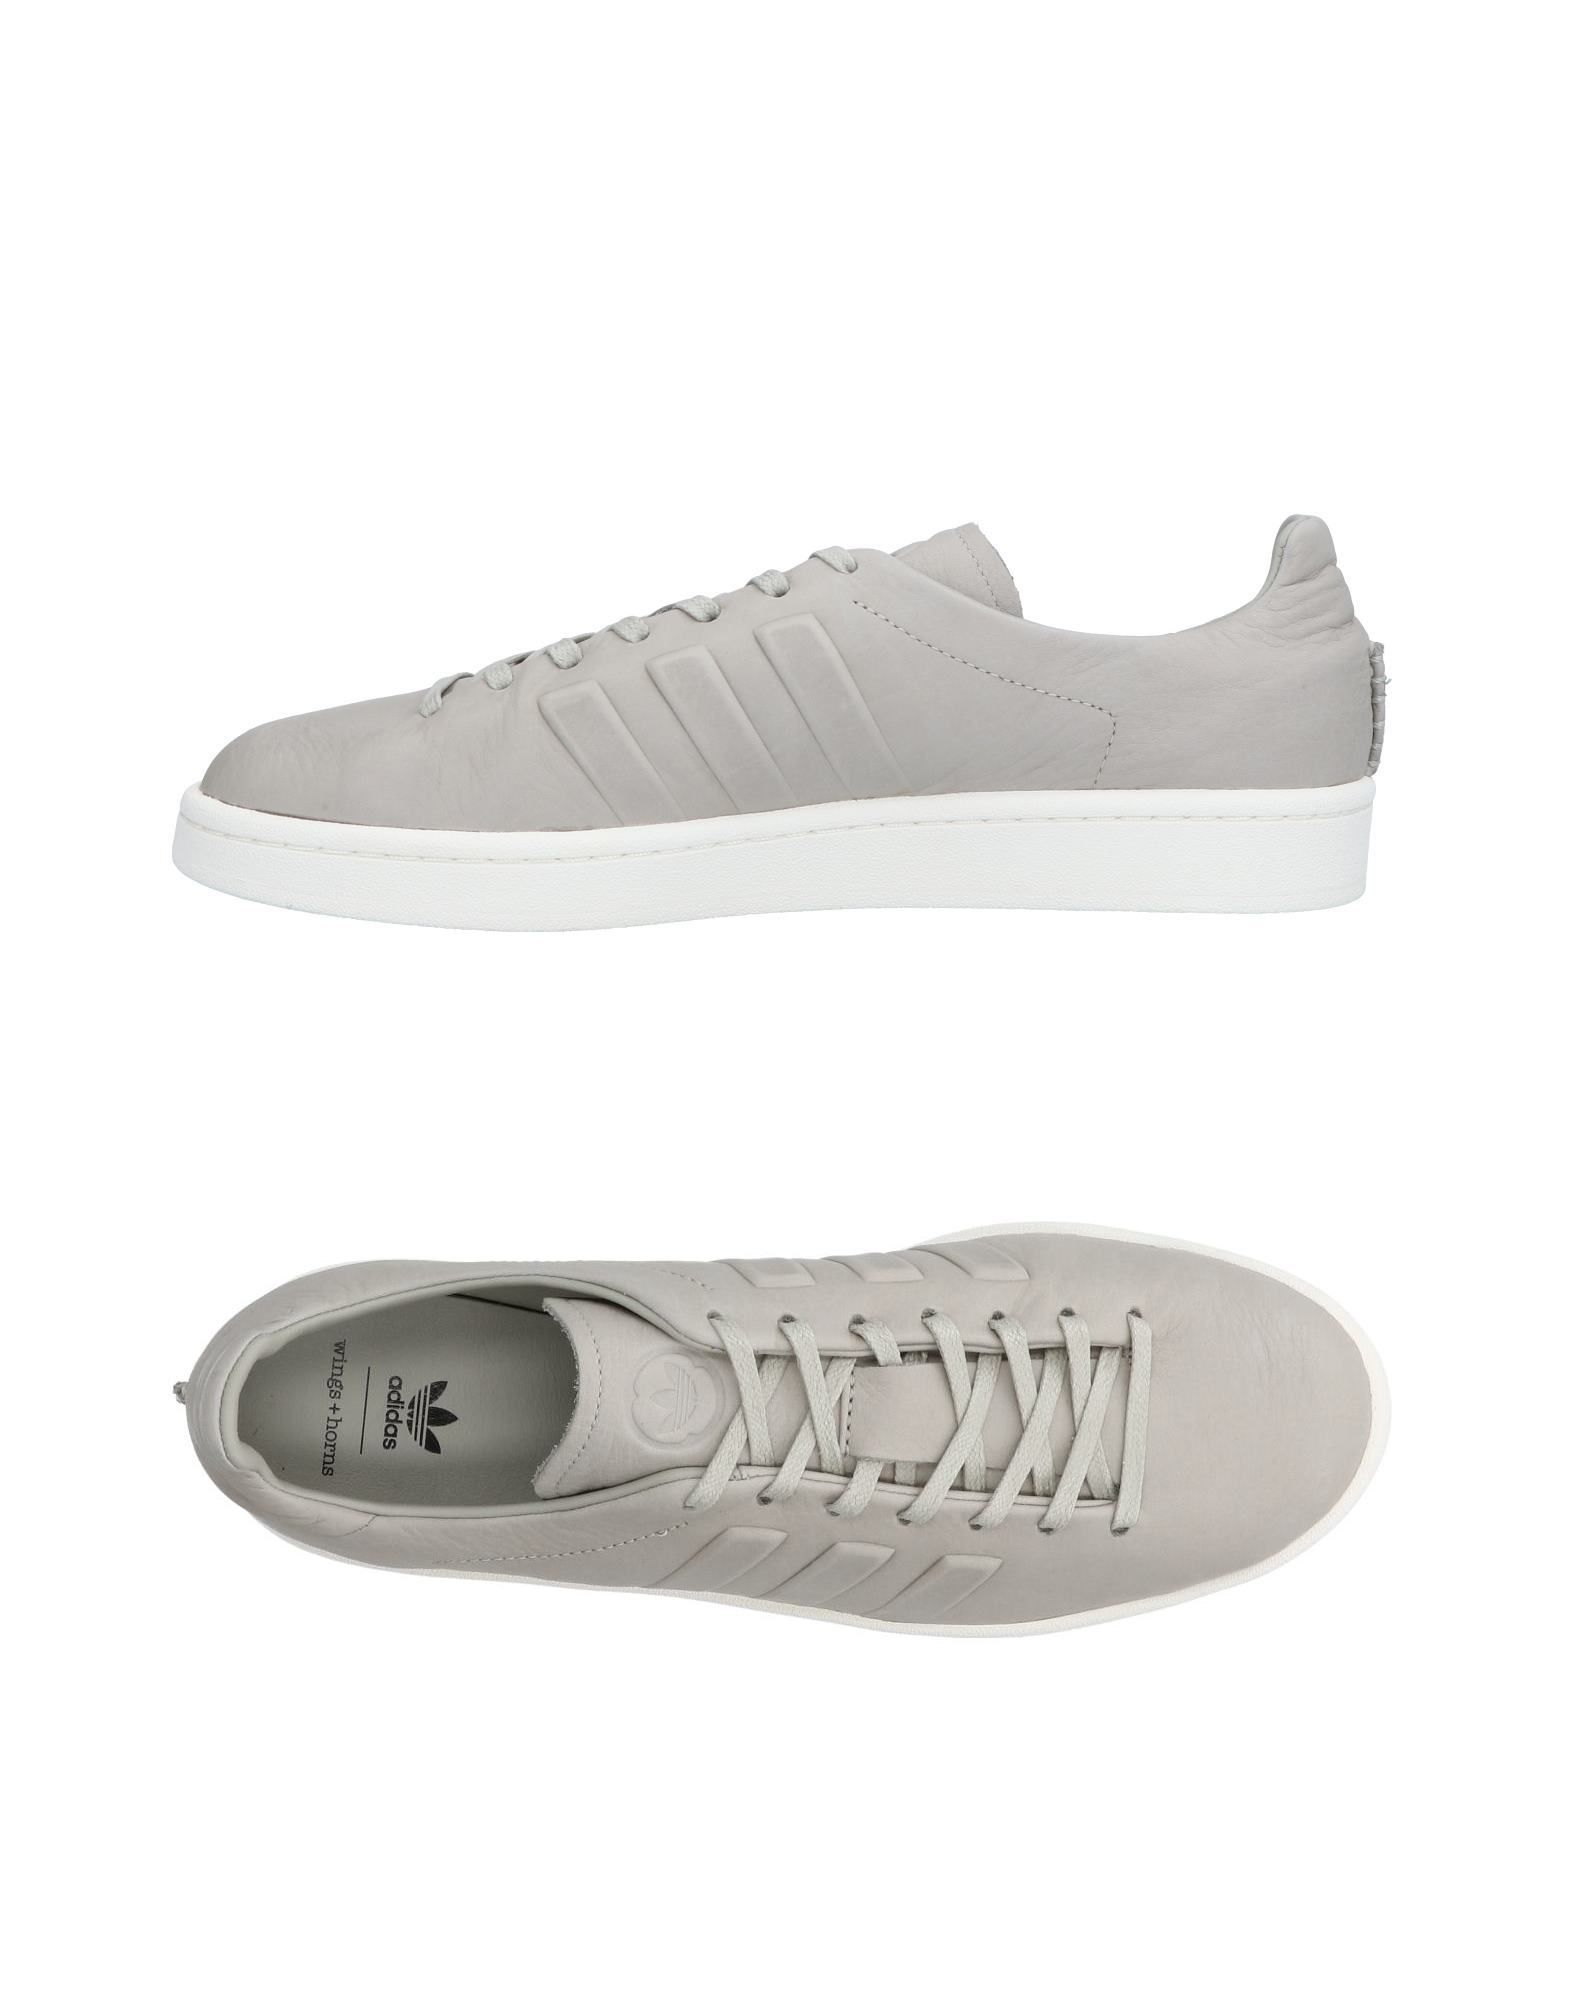 ADIDAS BY WINGS + HORNS Sneakers in Light Grey